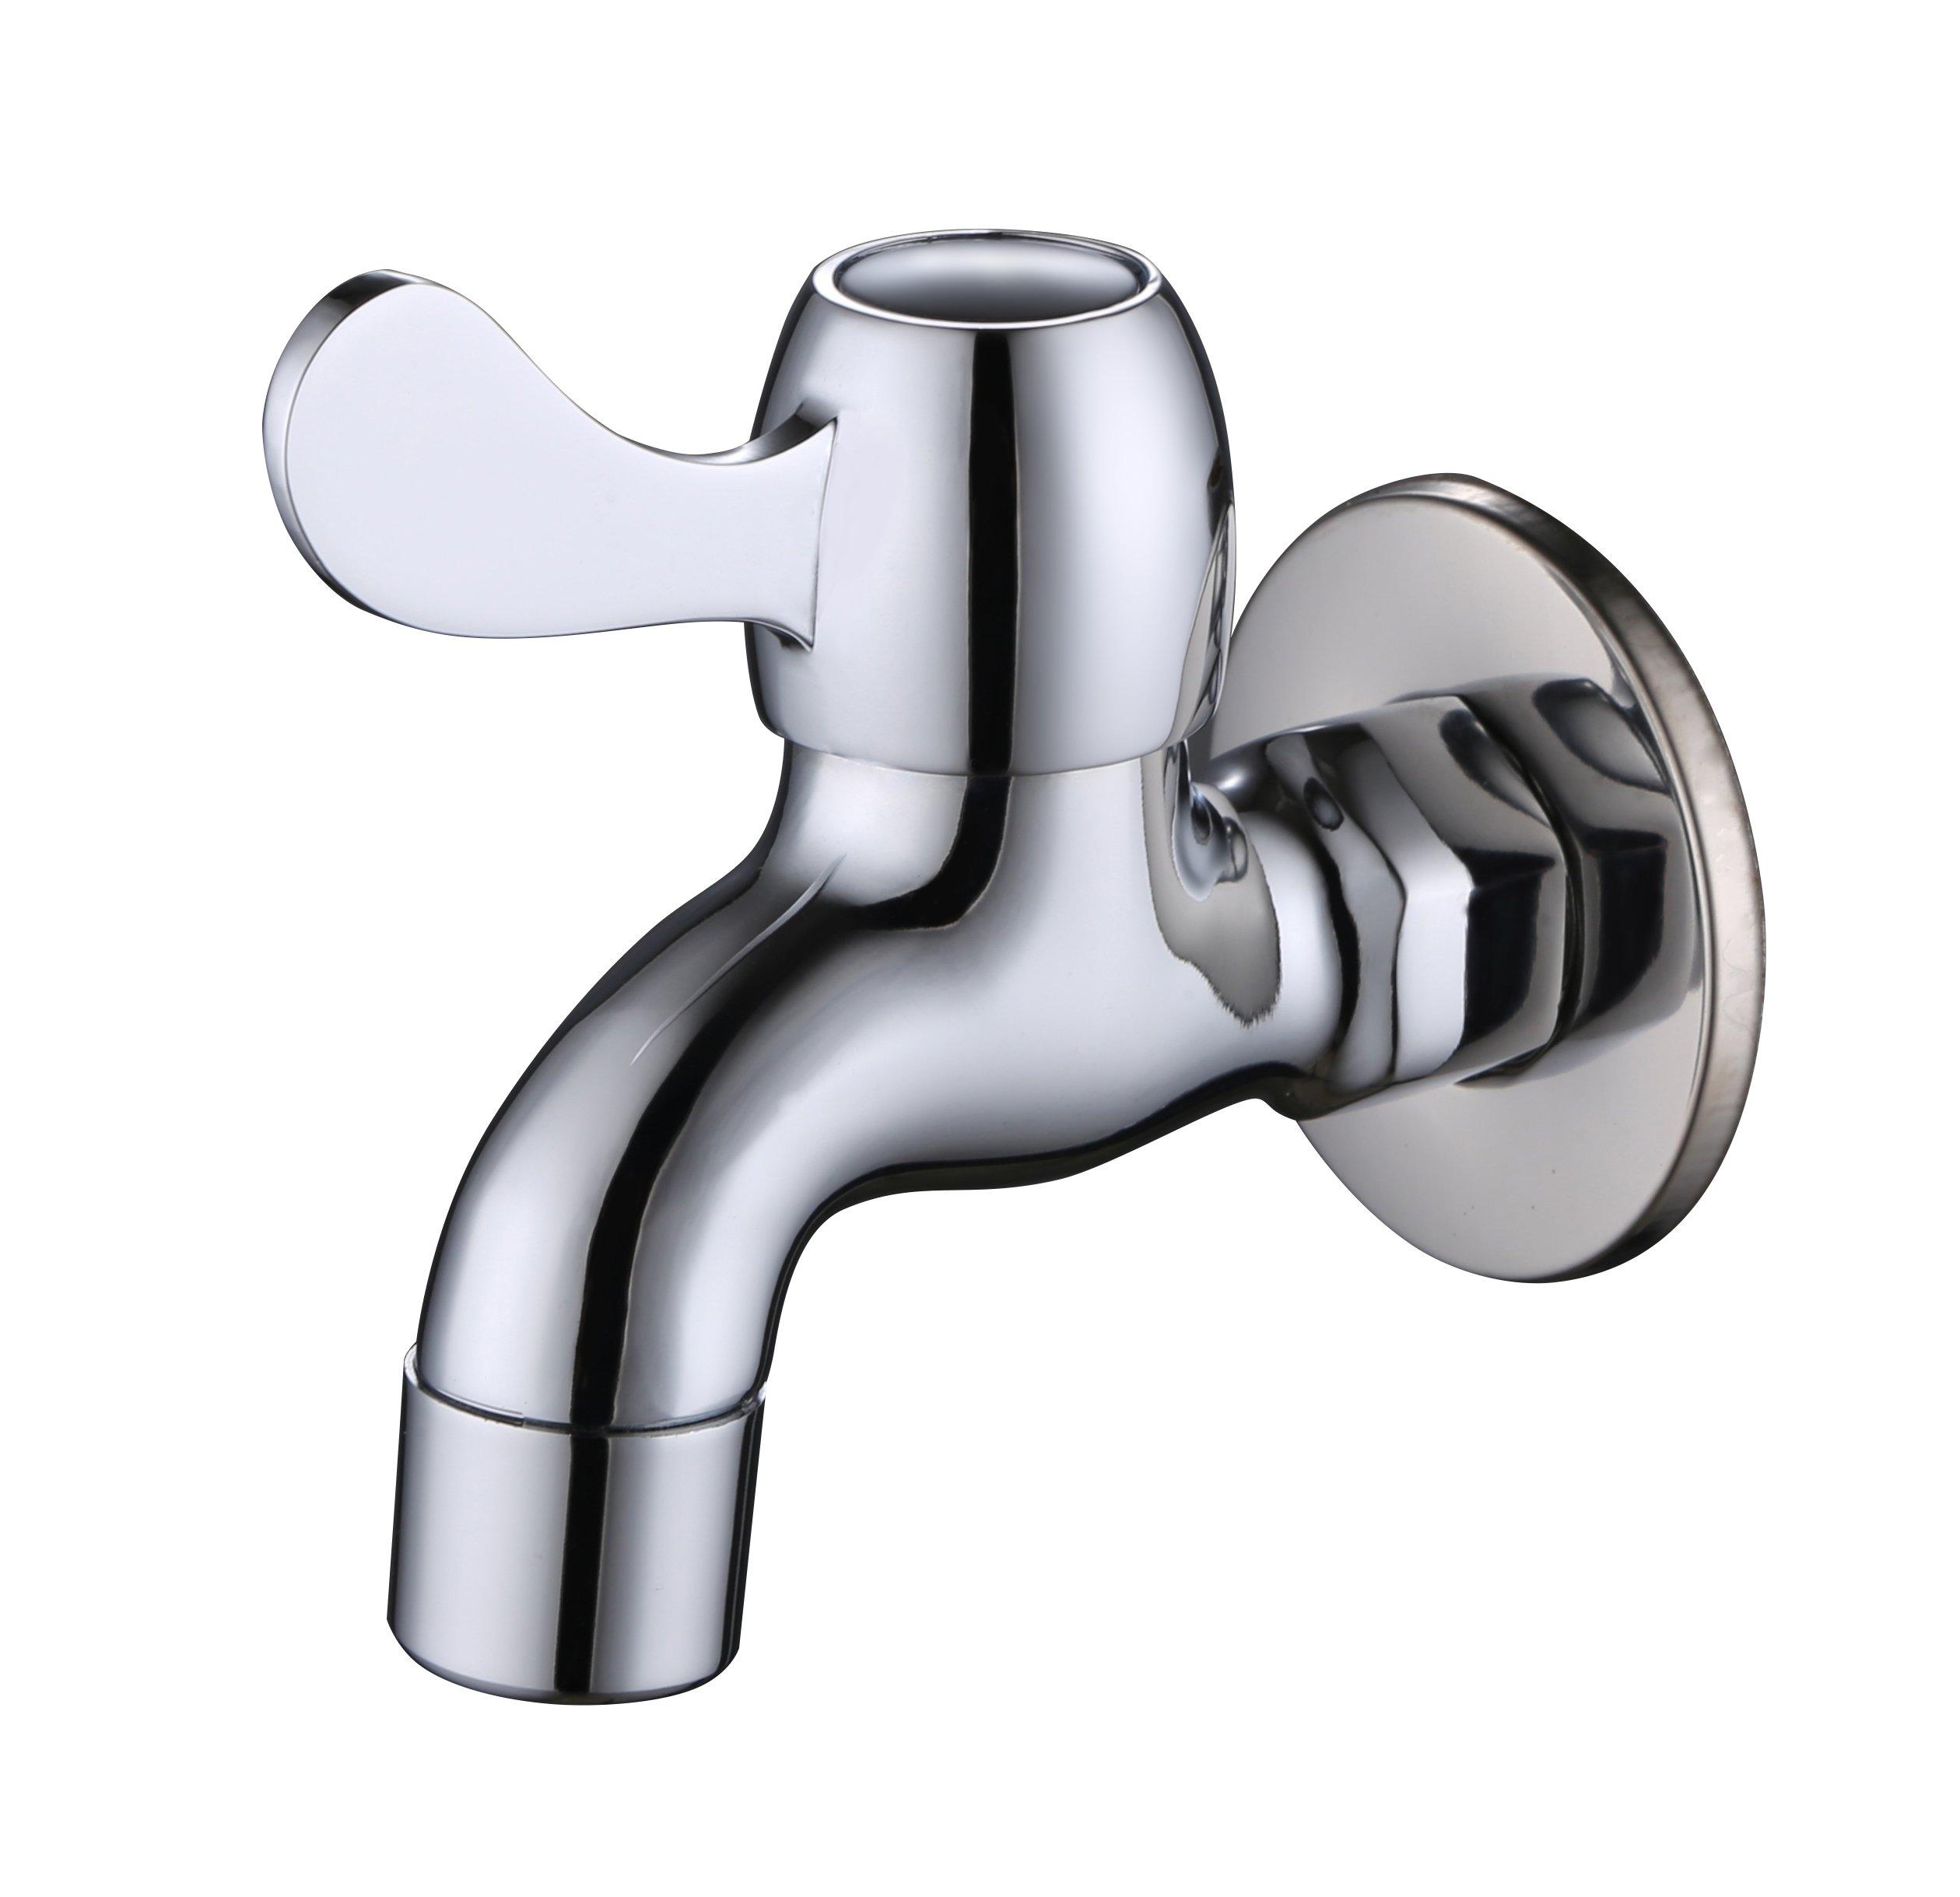 Frascio Faucet Full Copper Casting Outdoor/Garden/Washing Machine/Bath Tub Tap Faucet,Chrome (garden faucet01)